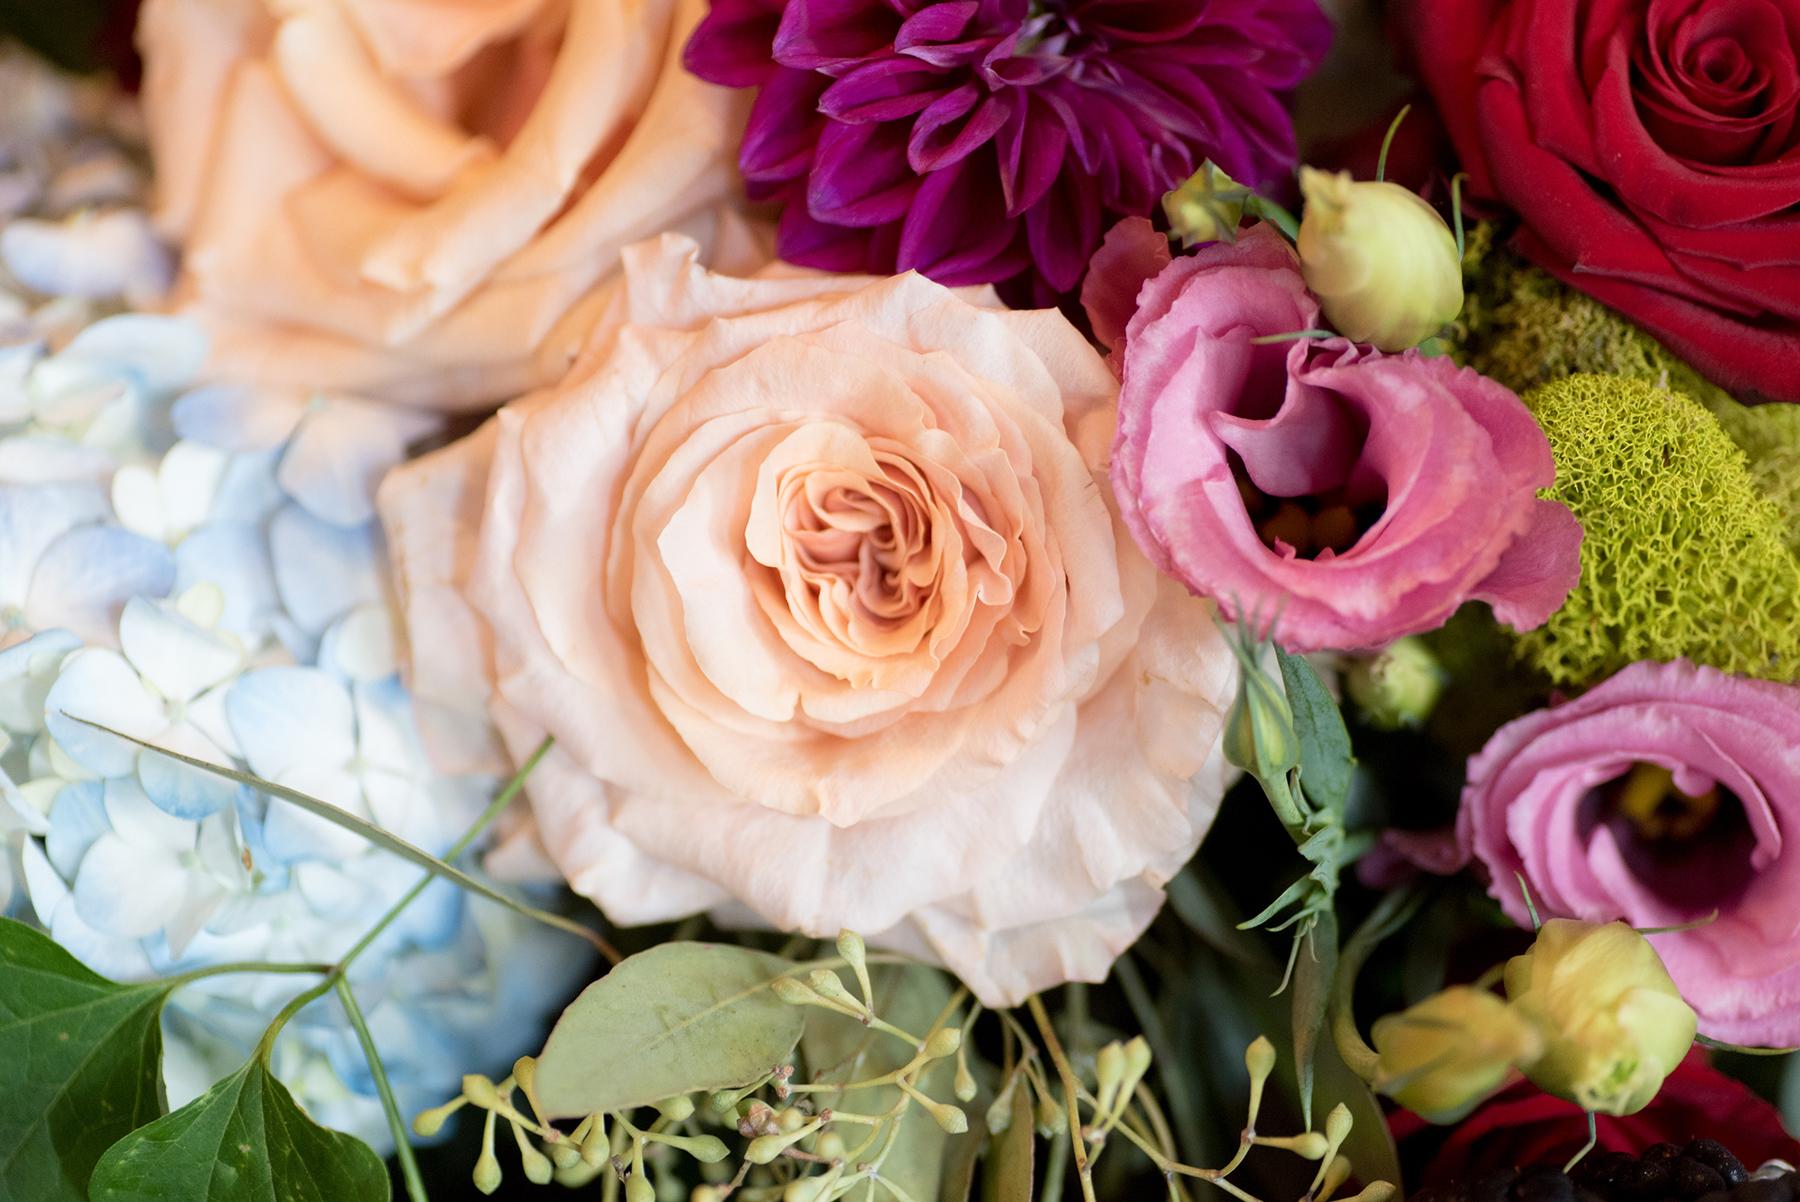 event-design-table-setting-detail-moss-dalias-hydrangias-roses-fall-theme.jpg